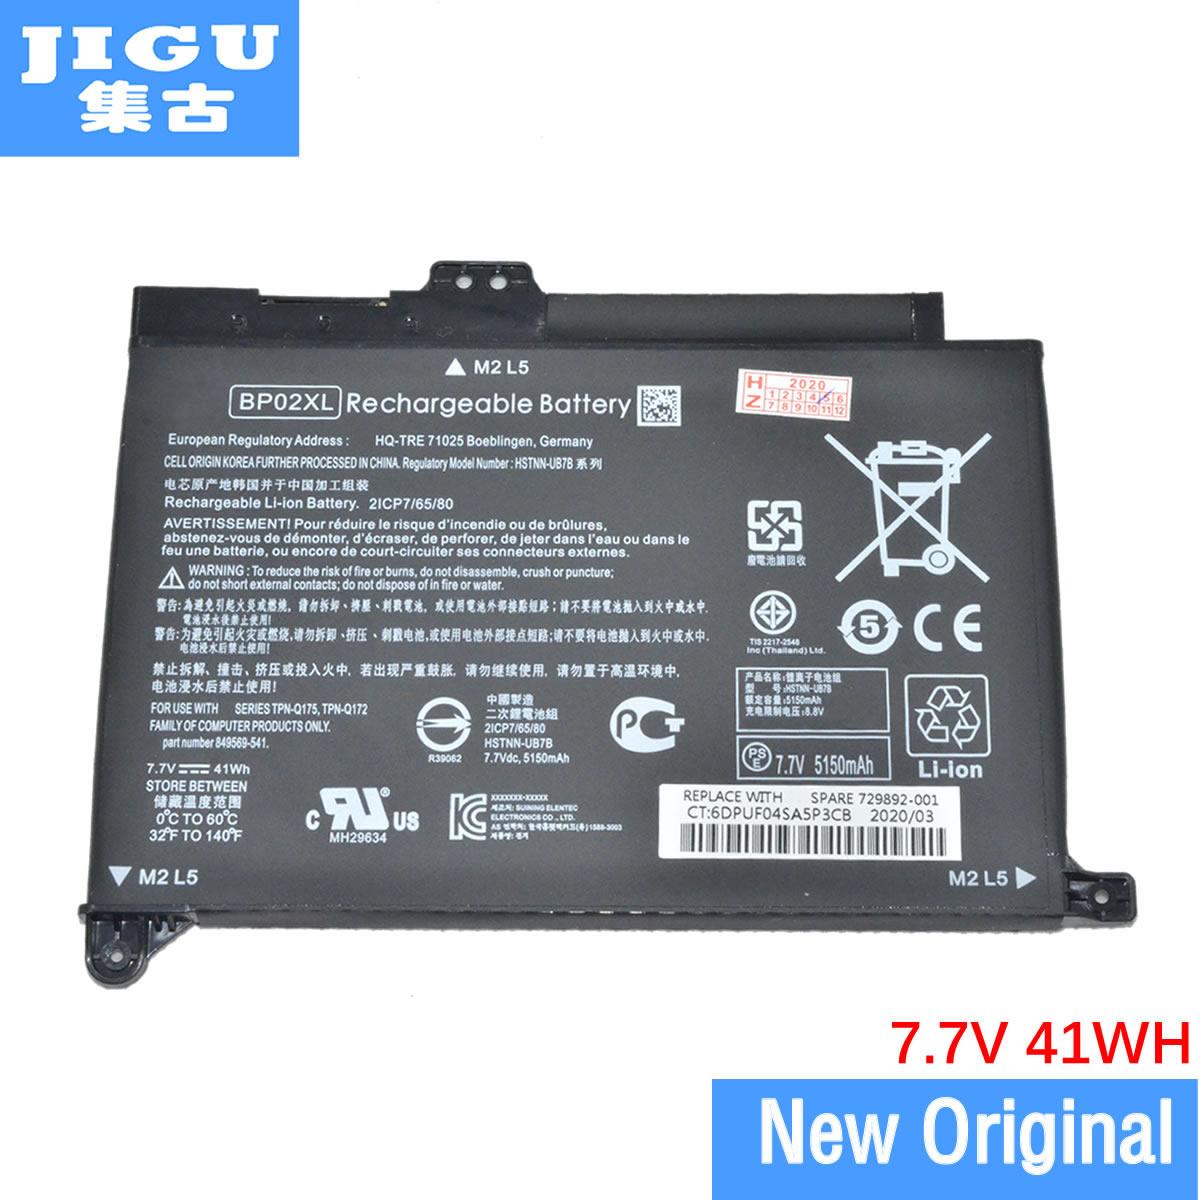 JIGU BP02XL جديد بطارية كمبيوتر محمول ل HP جناح 15-AU010WM 15-AU018 15-AU136TX HSTNN-LB7H HSTNN-UB7B 849569-541 849569-421